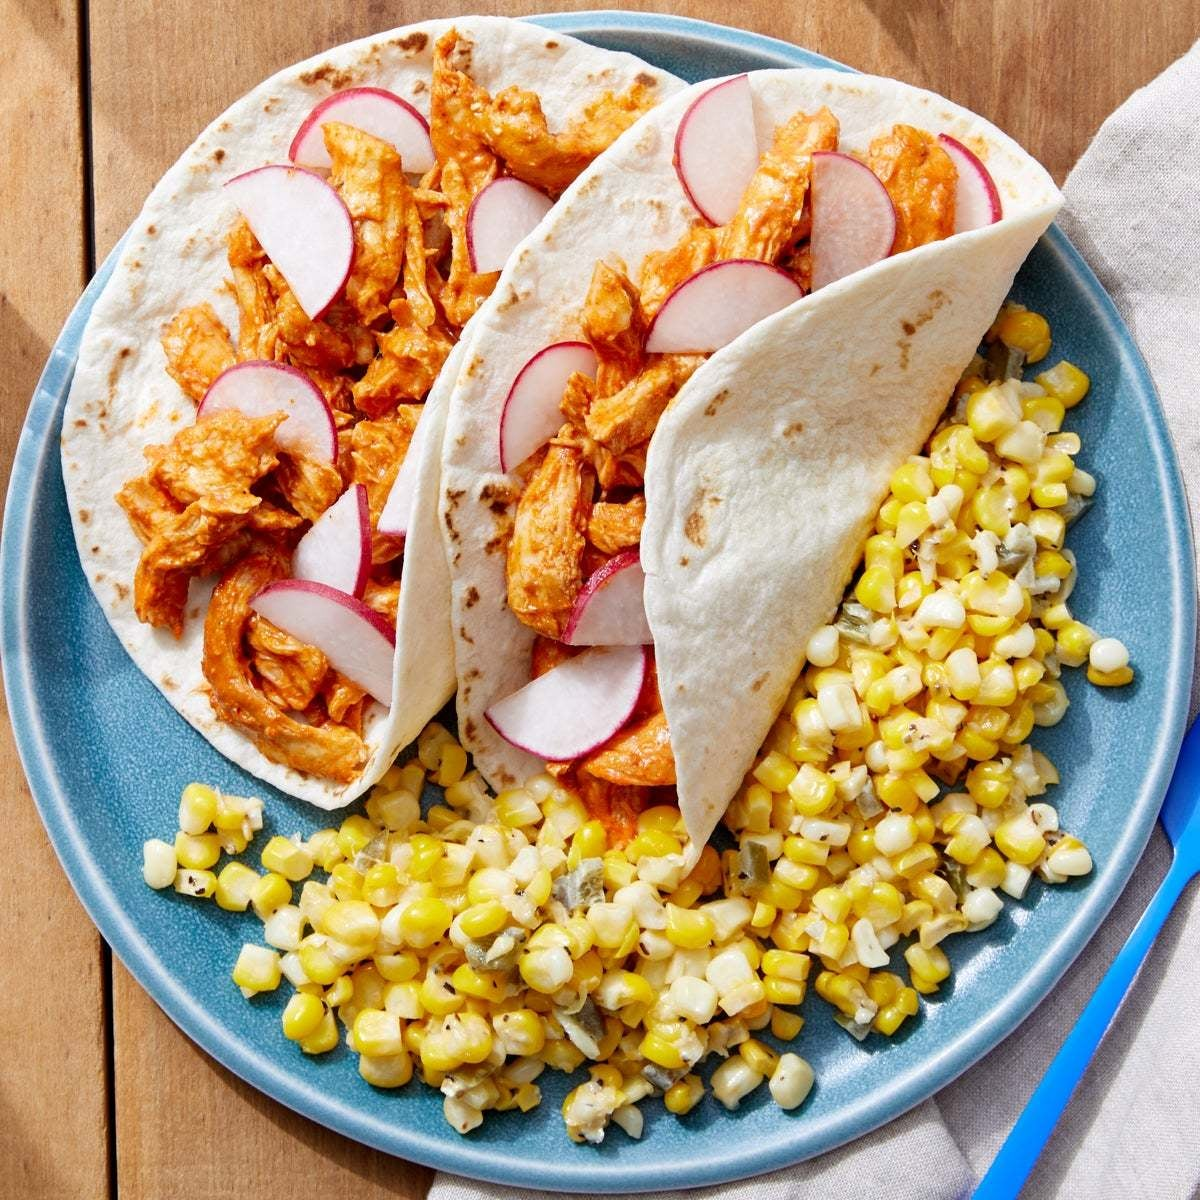 Shredded Guajillo Chicken Tacos with Spicy Corn Sauté